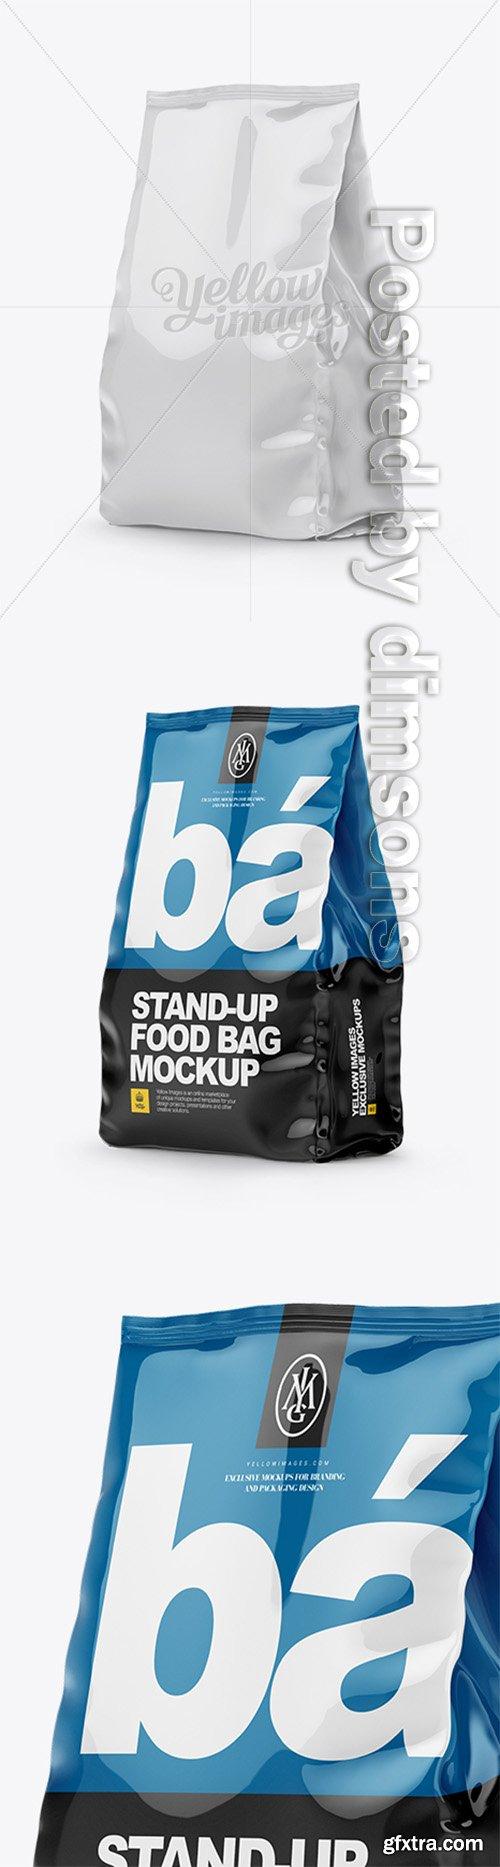 Glossy Stand-up Bag Mockup - Half Side View 14851